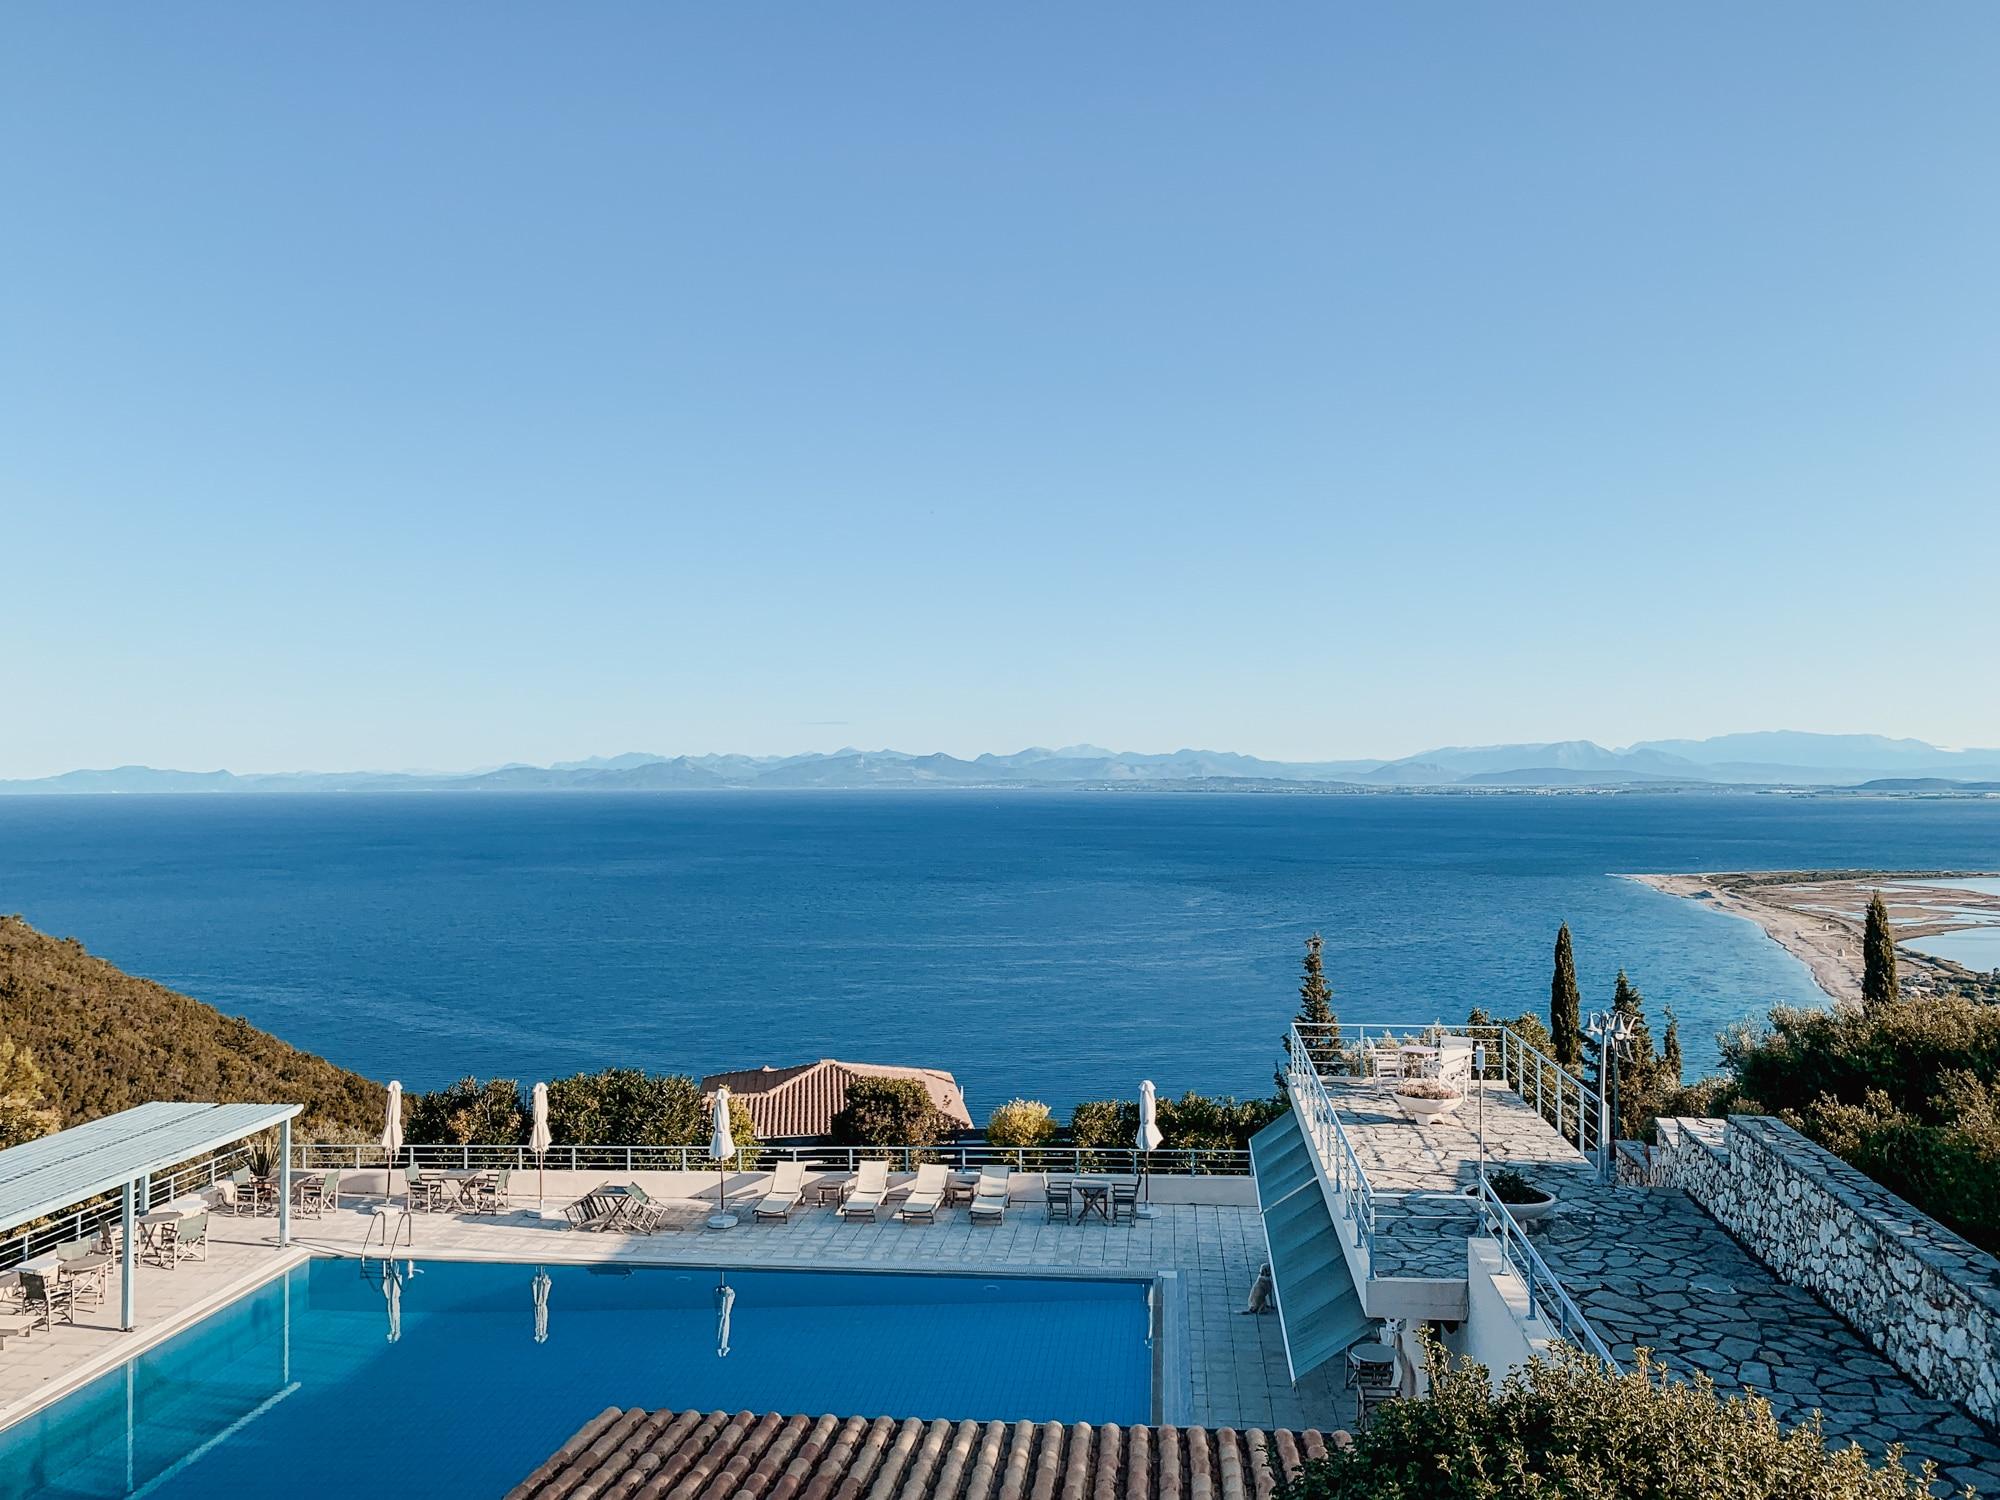 Mira Resort auf Lefkada